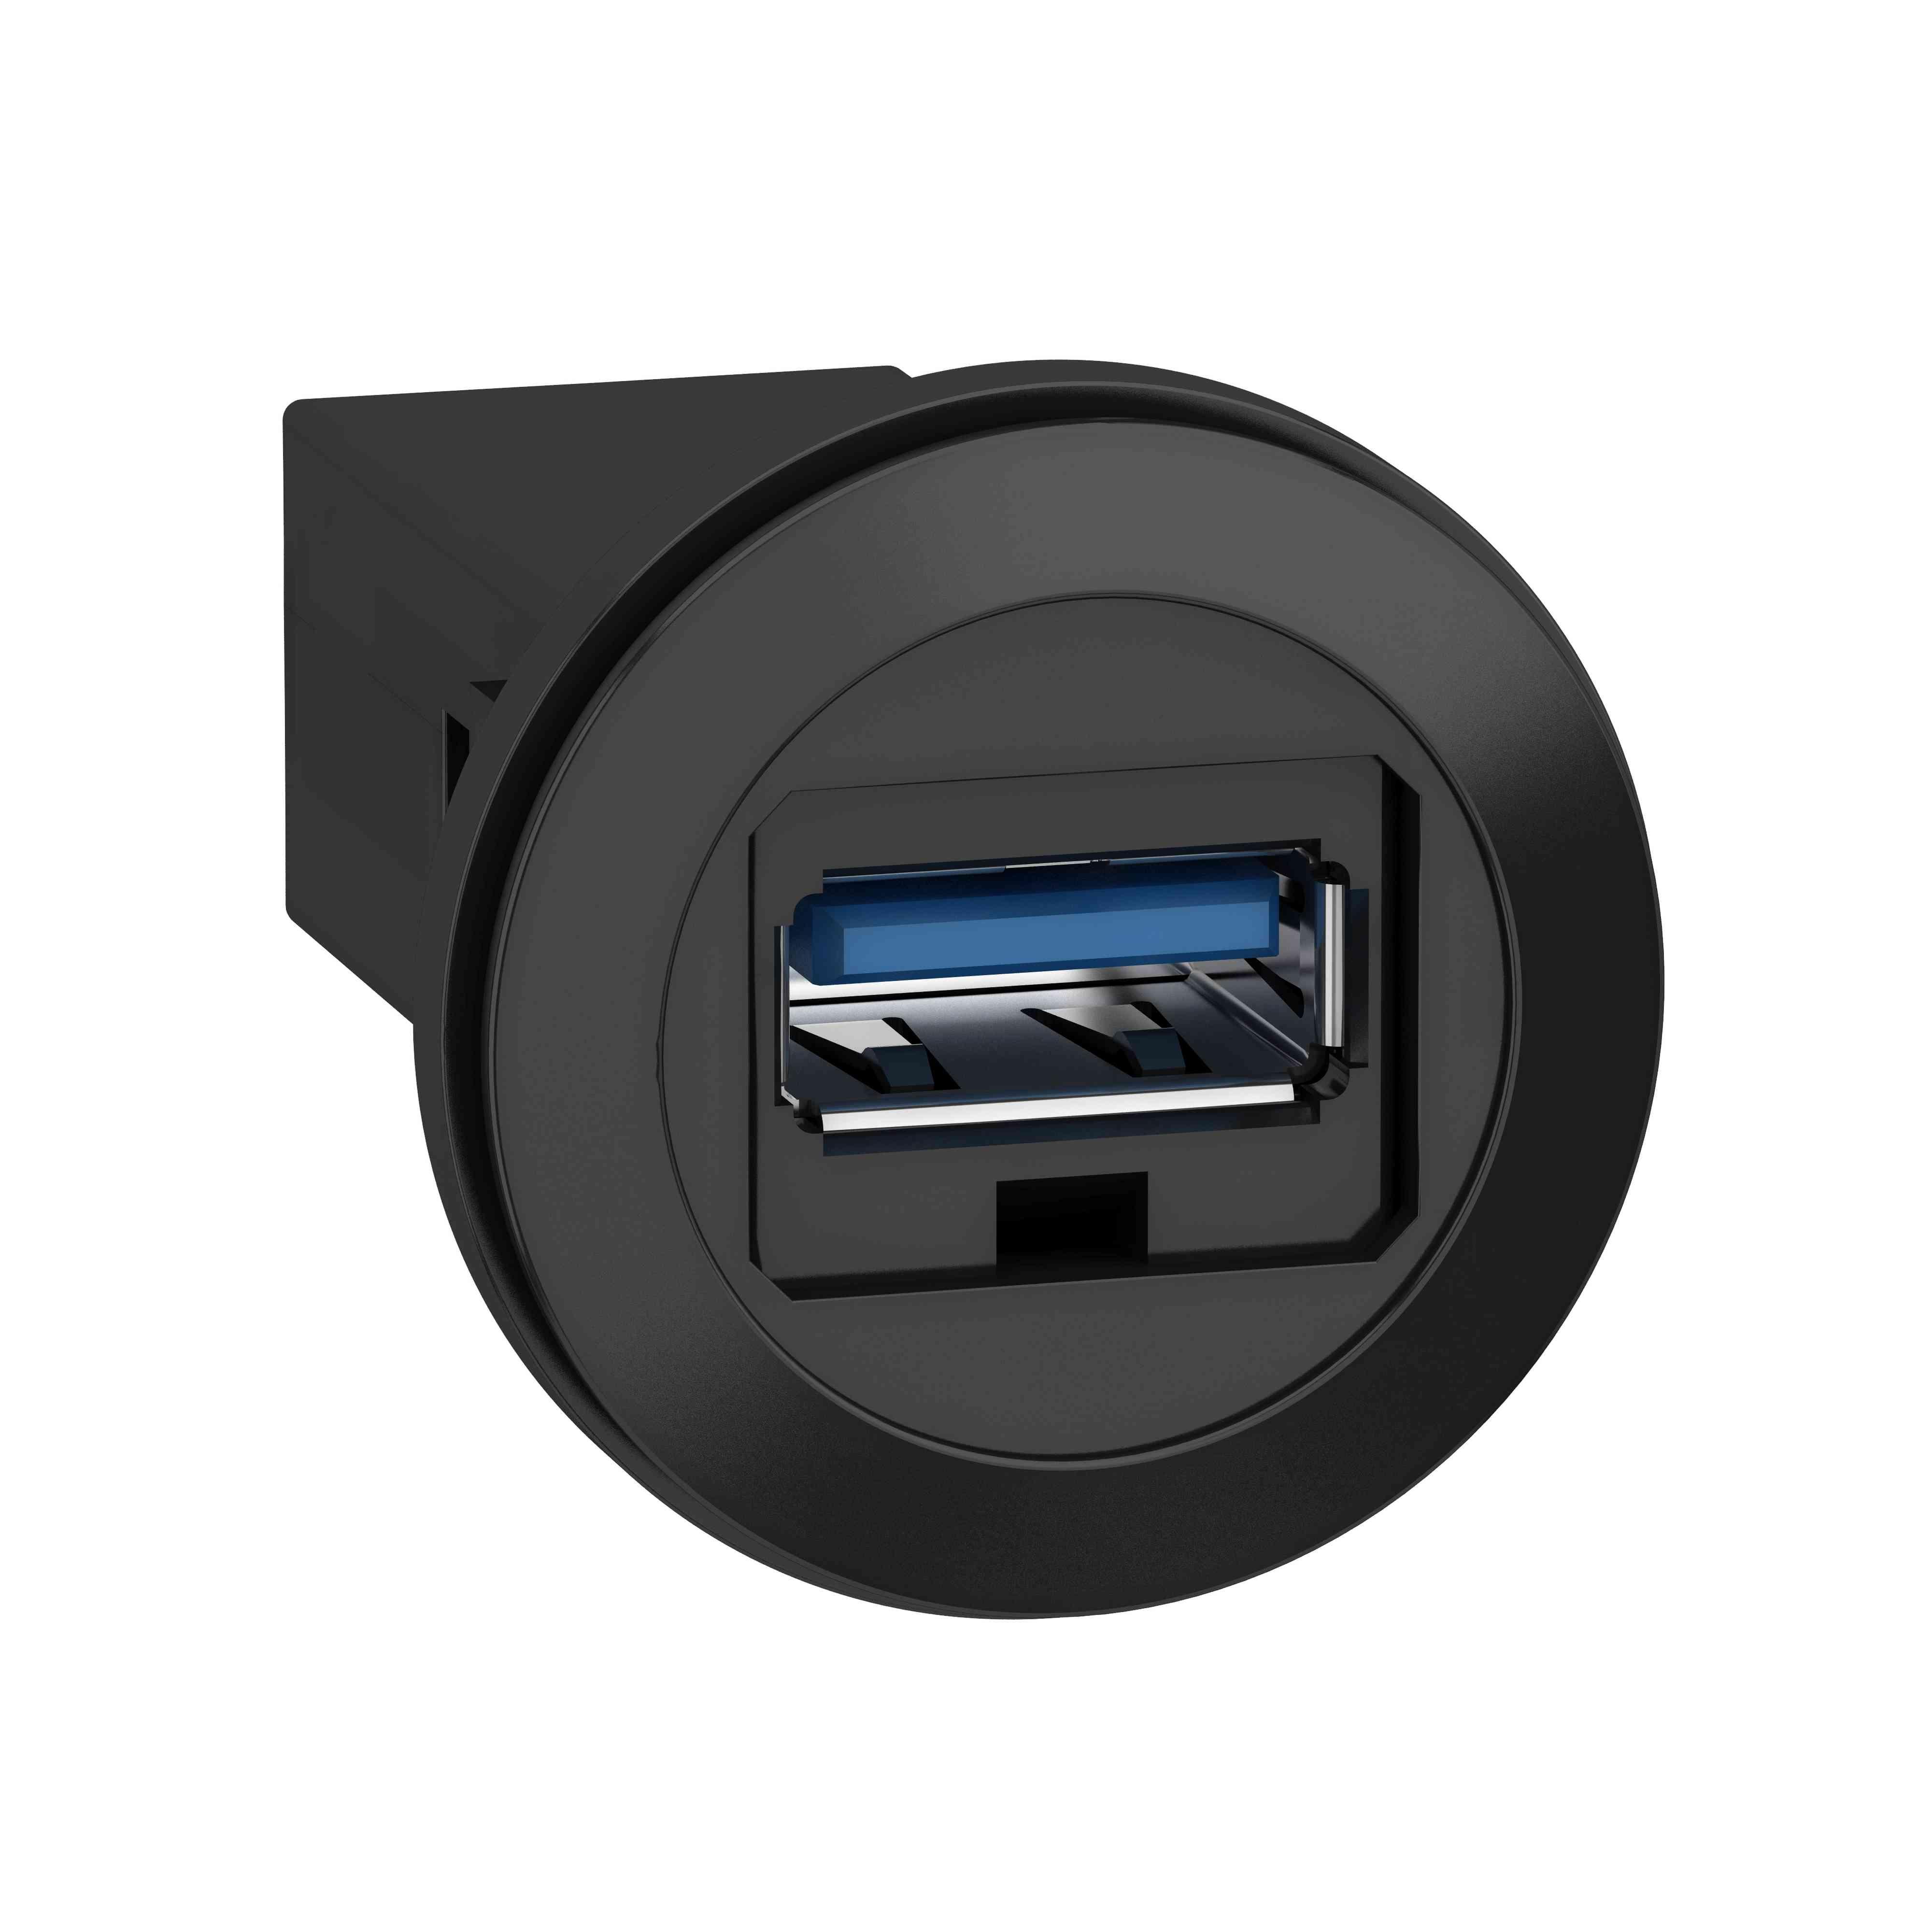 Na ploščo nameščena vrata USB 3.0 - Ø 22 mm - za vtičnico USB vmesnika, tip A